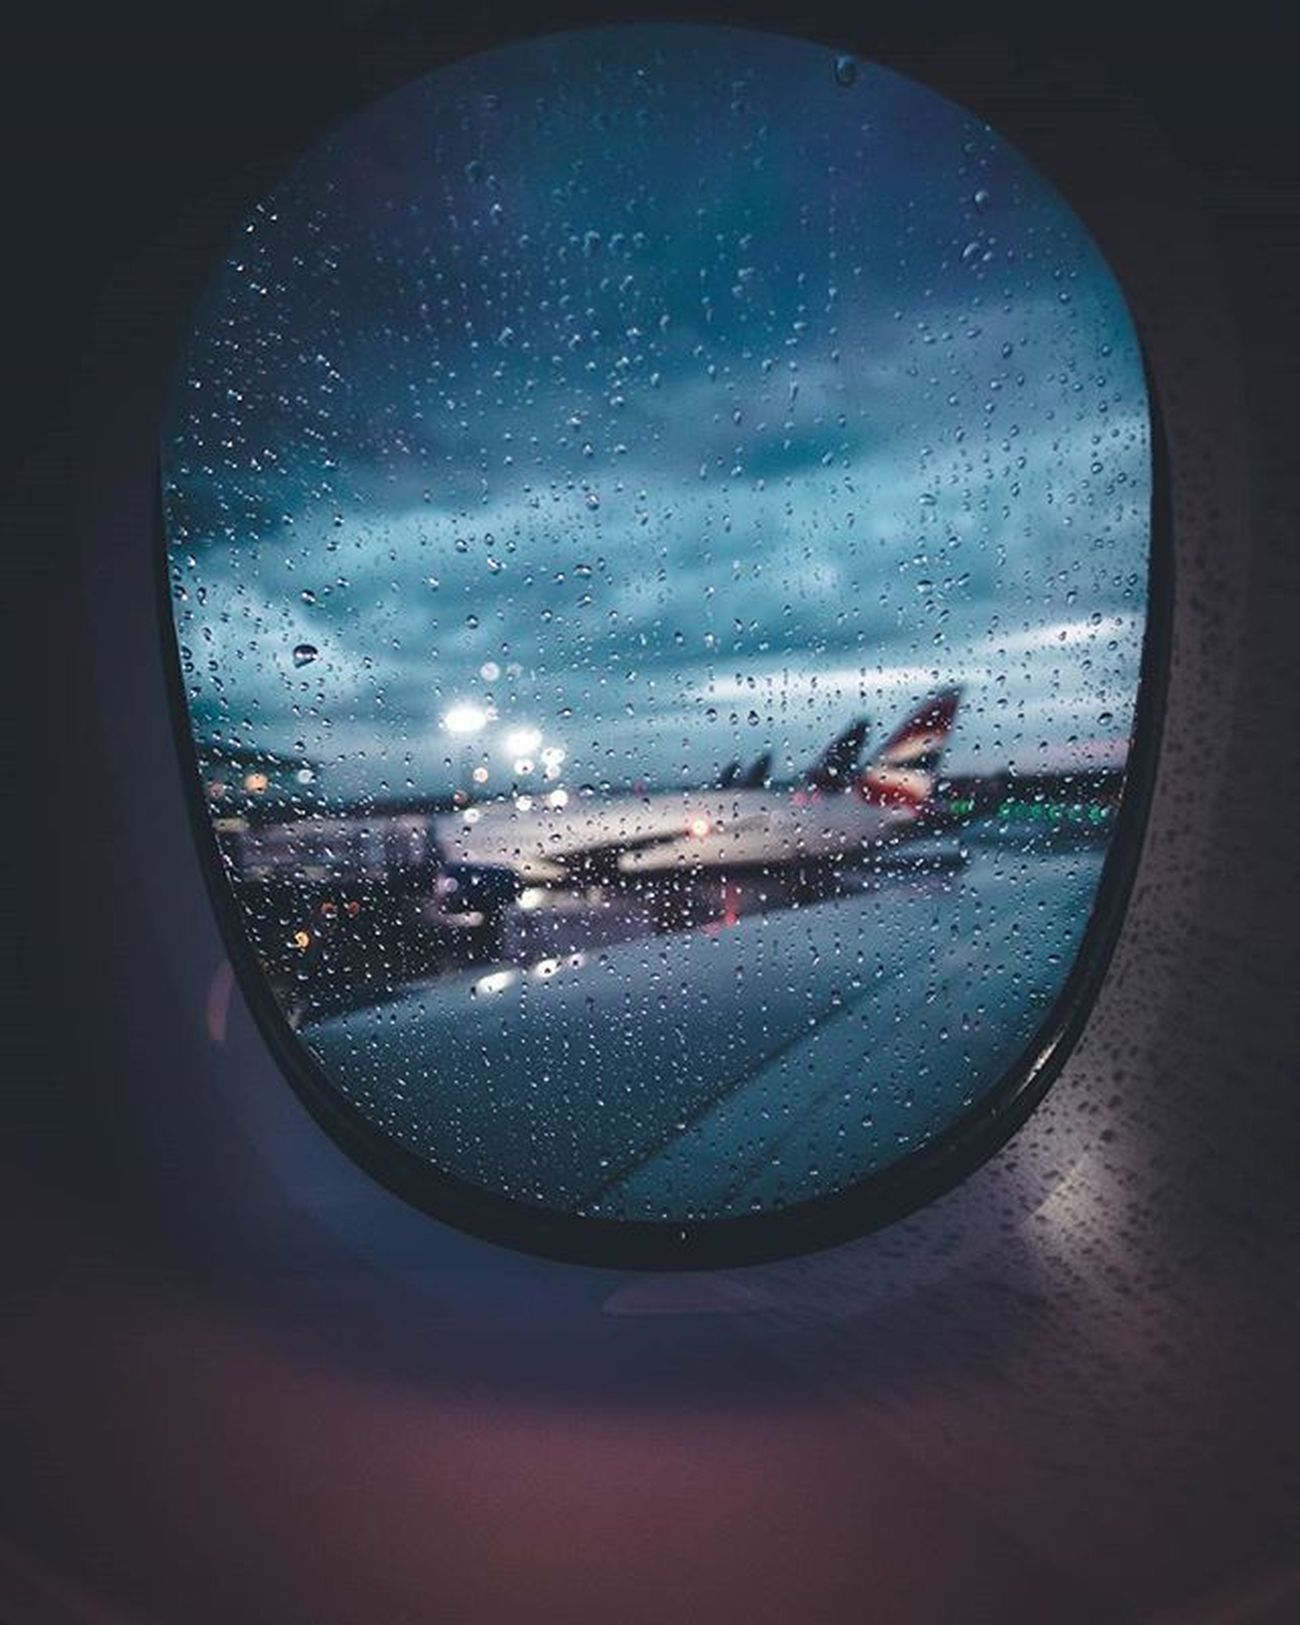 View from Ba A380 at Heathrow Airport Highlife Britishairways Aviation A380 London Uk Heathrowairport Terminal5 Rain Window Tuesday Sonyrx100iv Lightroom Travelgram Photos Fly Ba Bacitysecrets